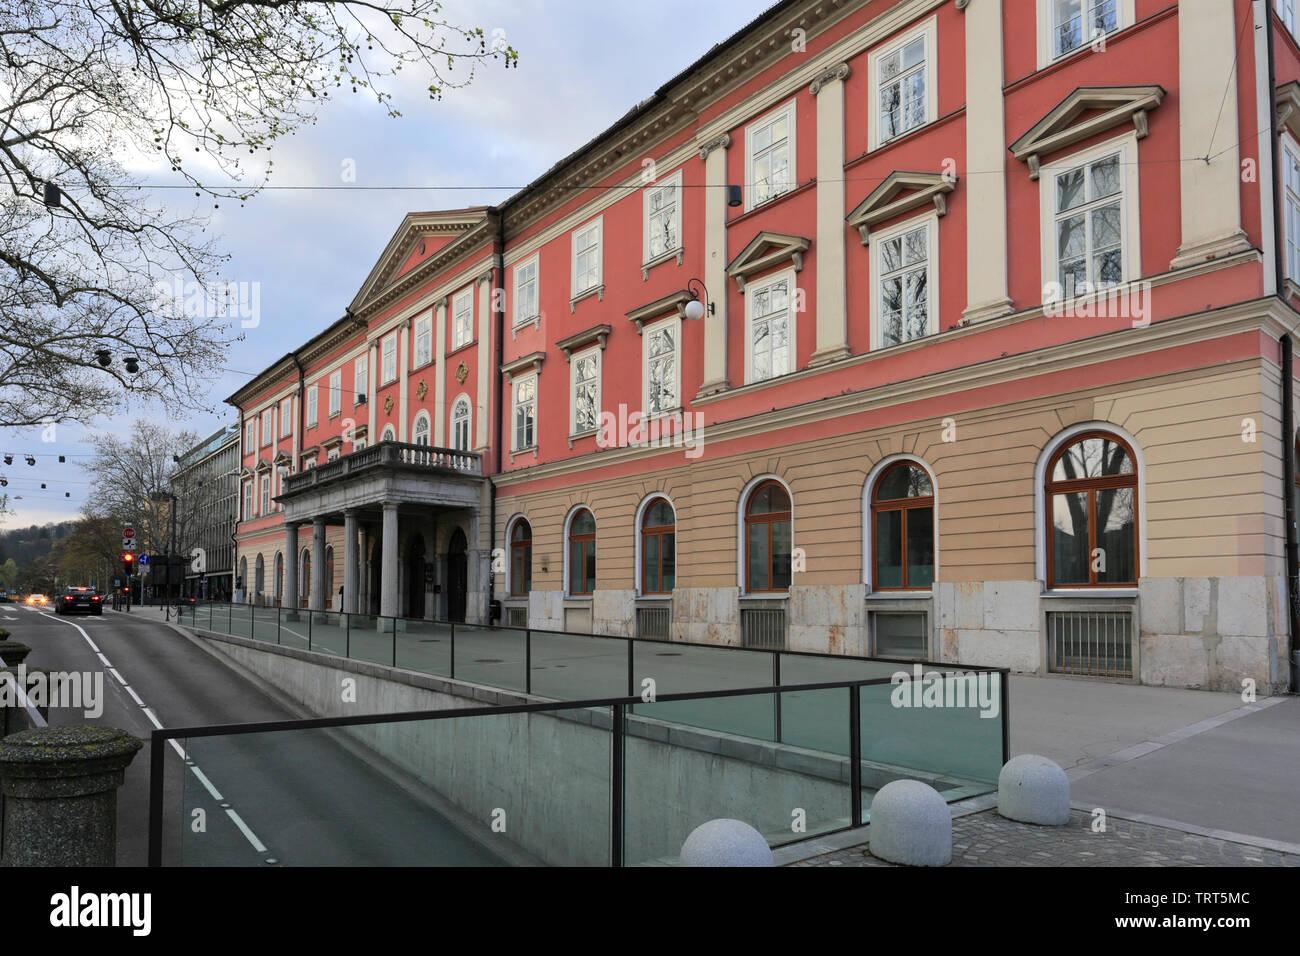 The Institute of Contemporary History building, Congress square, Ljubljana city, Slovenia, Europe - Stock Image